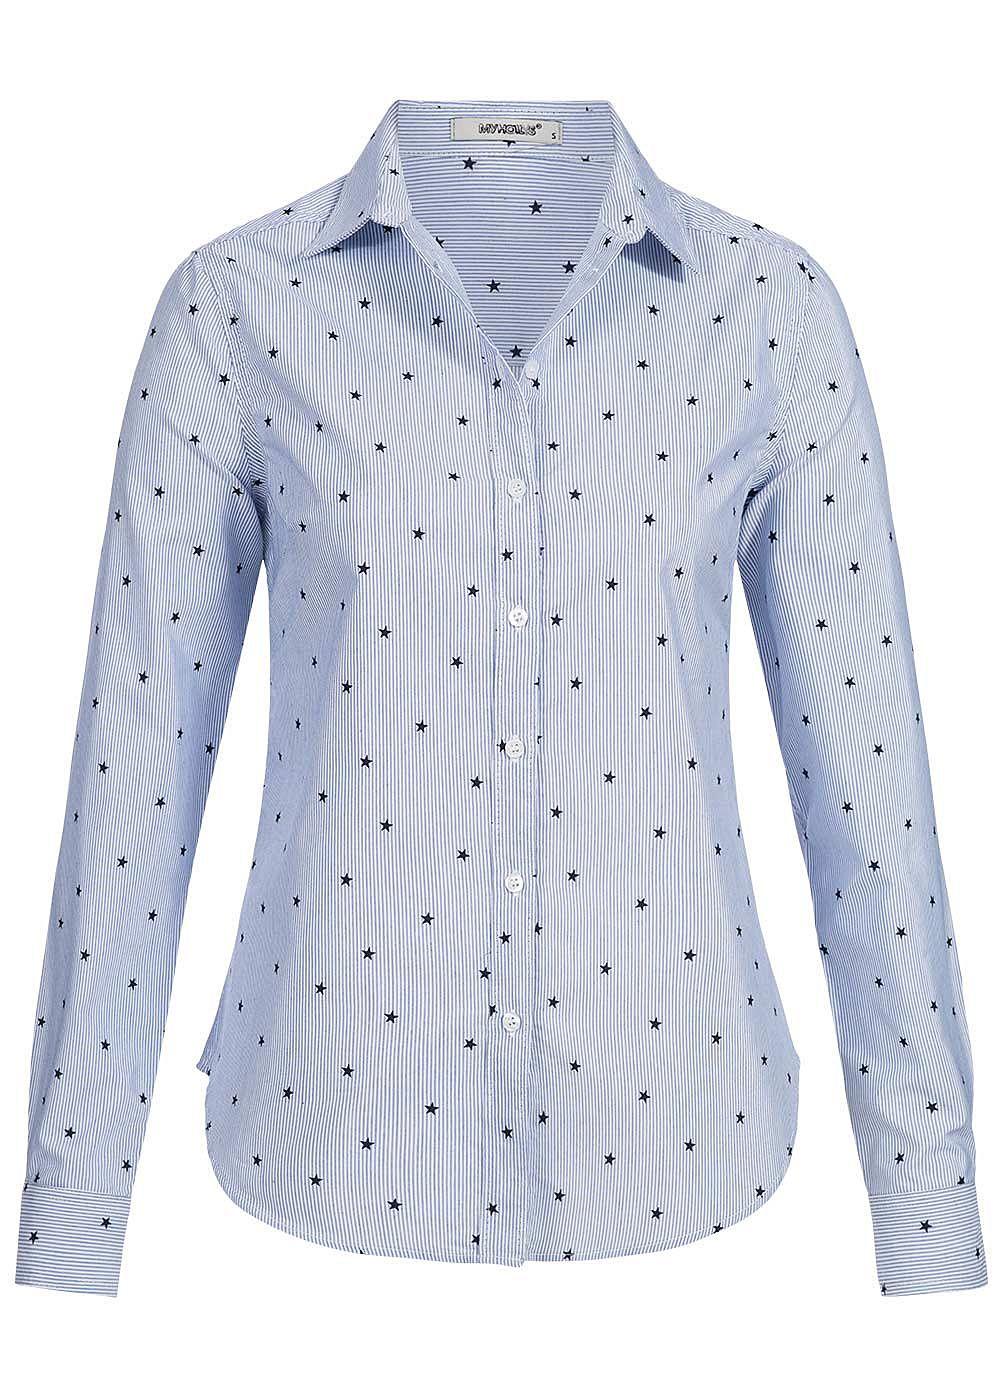 hailys damen bluse sterne muster gestreift blau weiss 77onlineshop. Black Bedroom Furniture Sets. Home Design Ideas